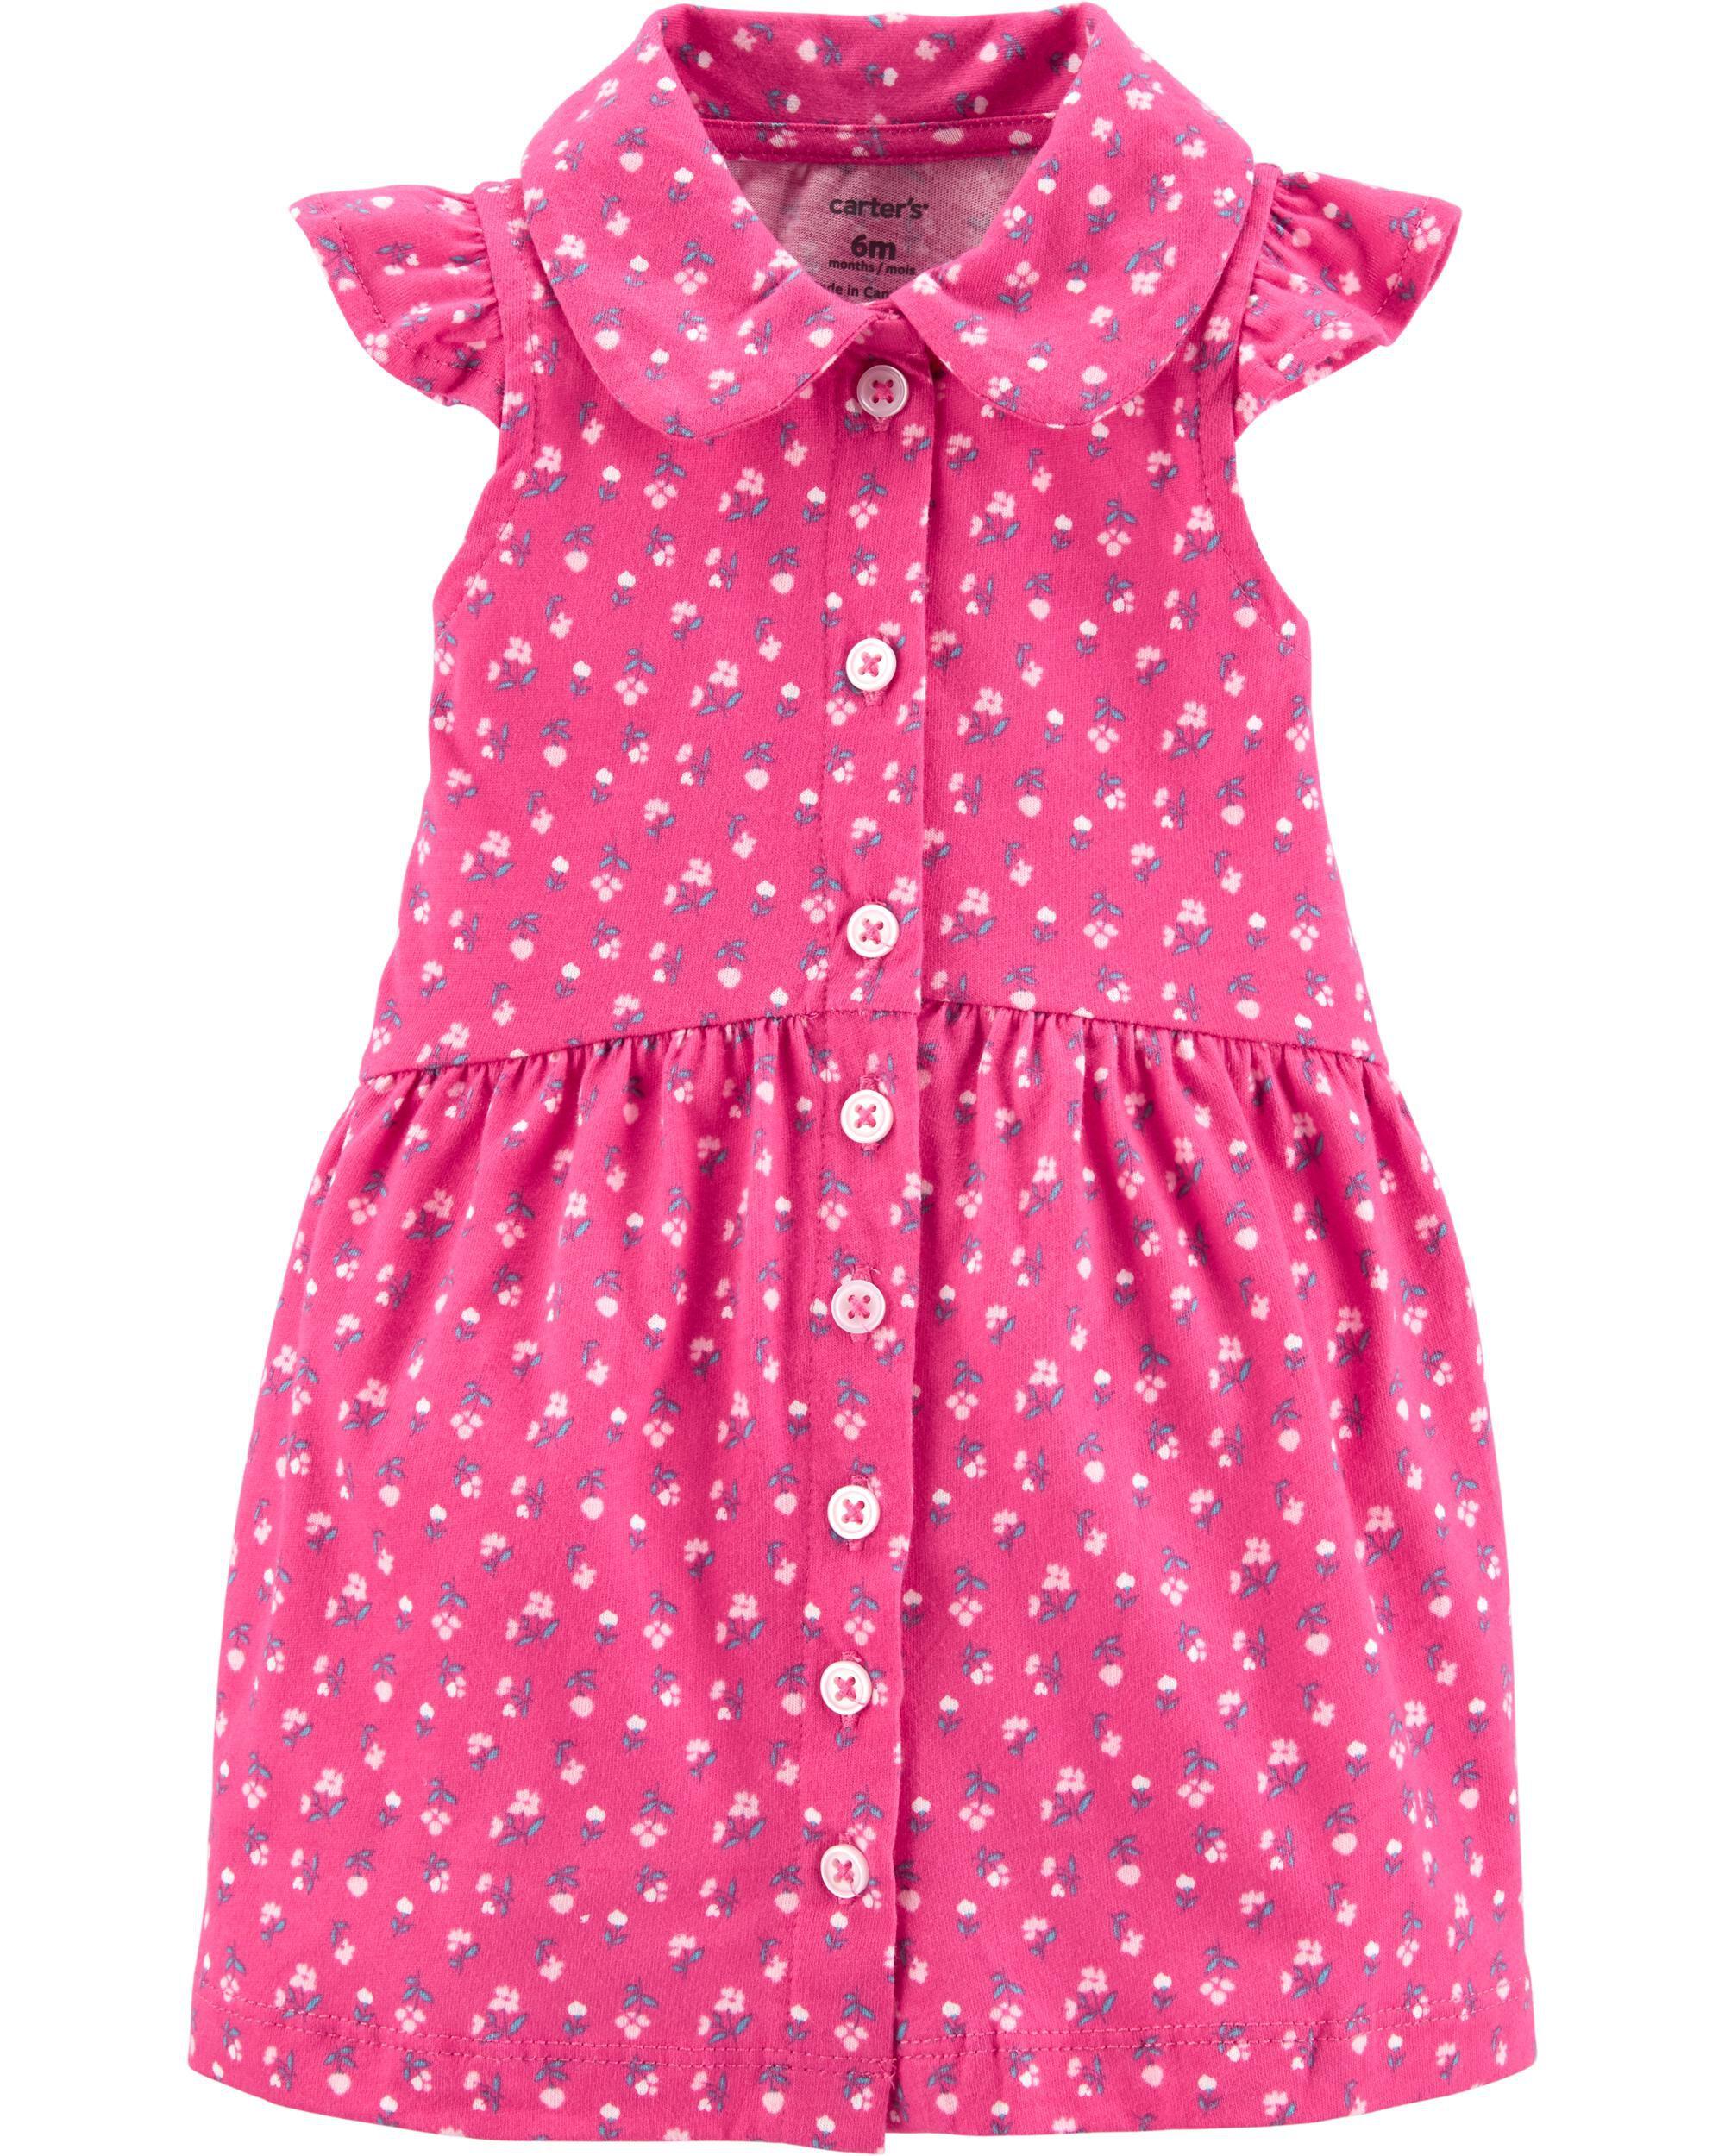 *DOORBUSTER* Floral Button-Front Shirt Dress